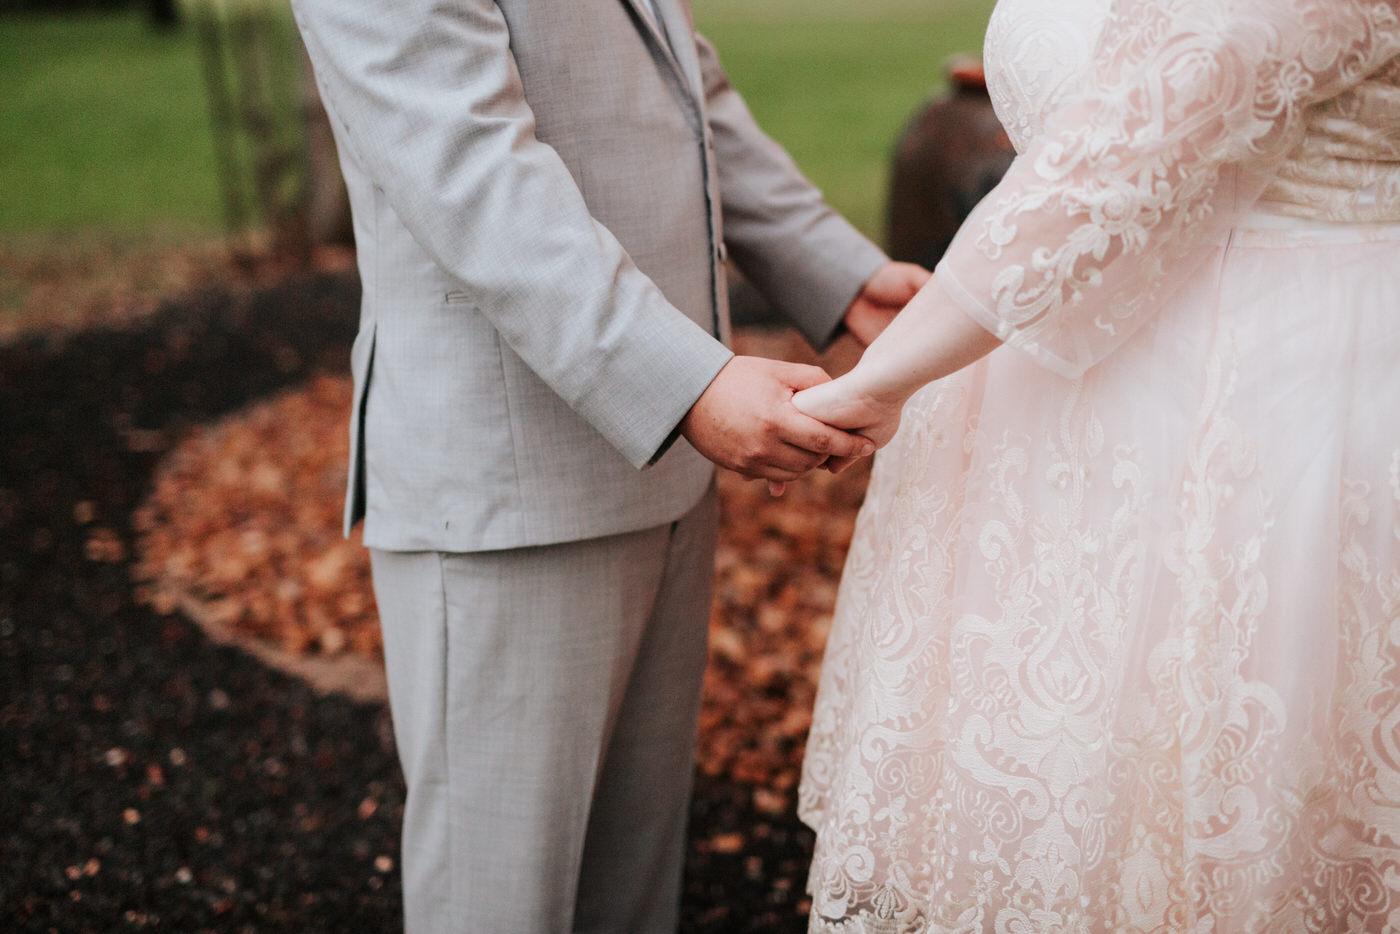 Bride and groom at Pecan Springs Ranch wedding